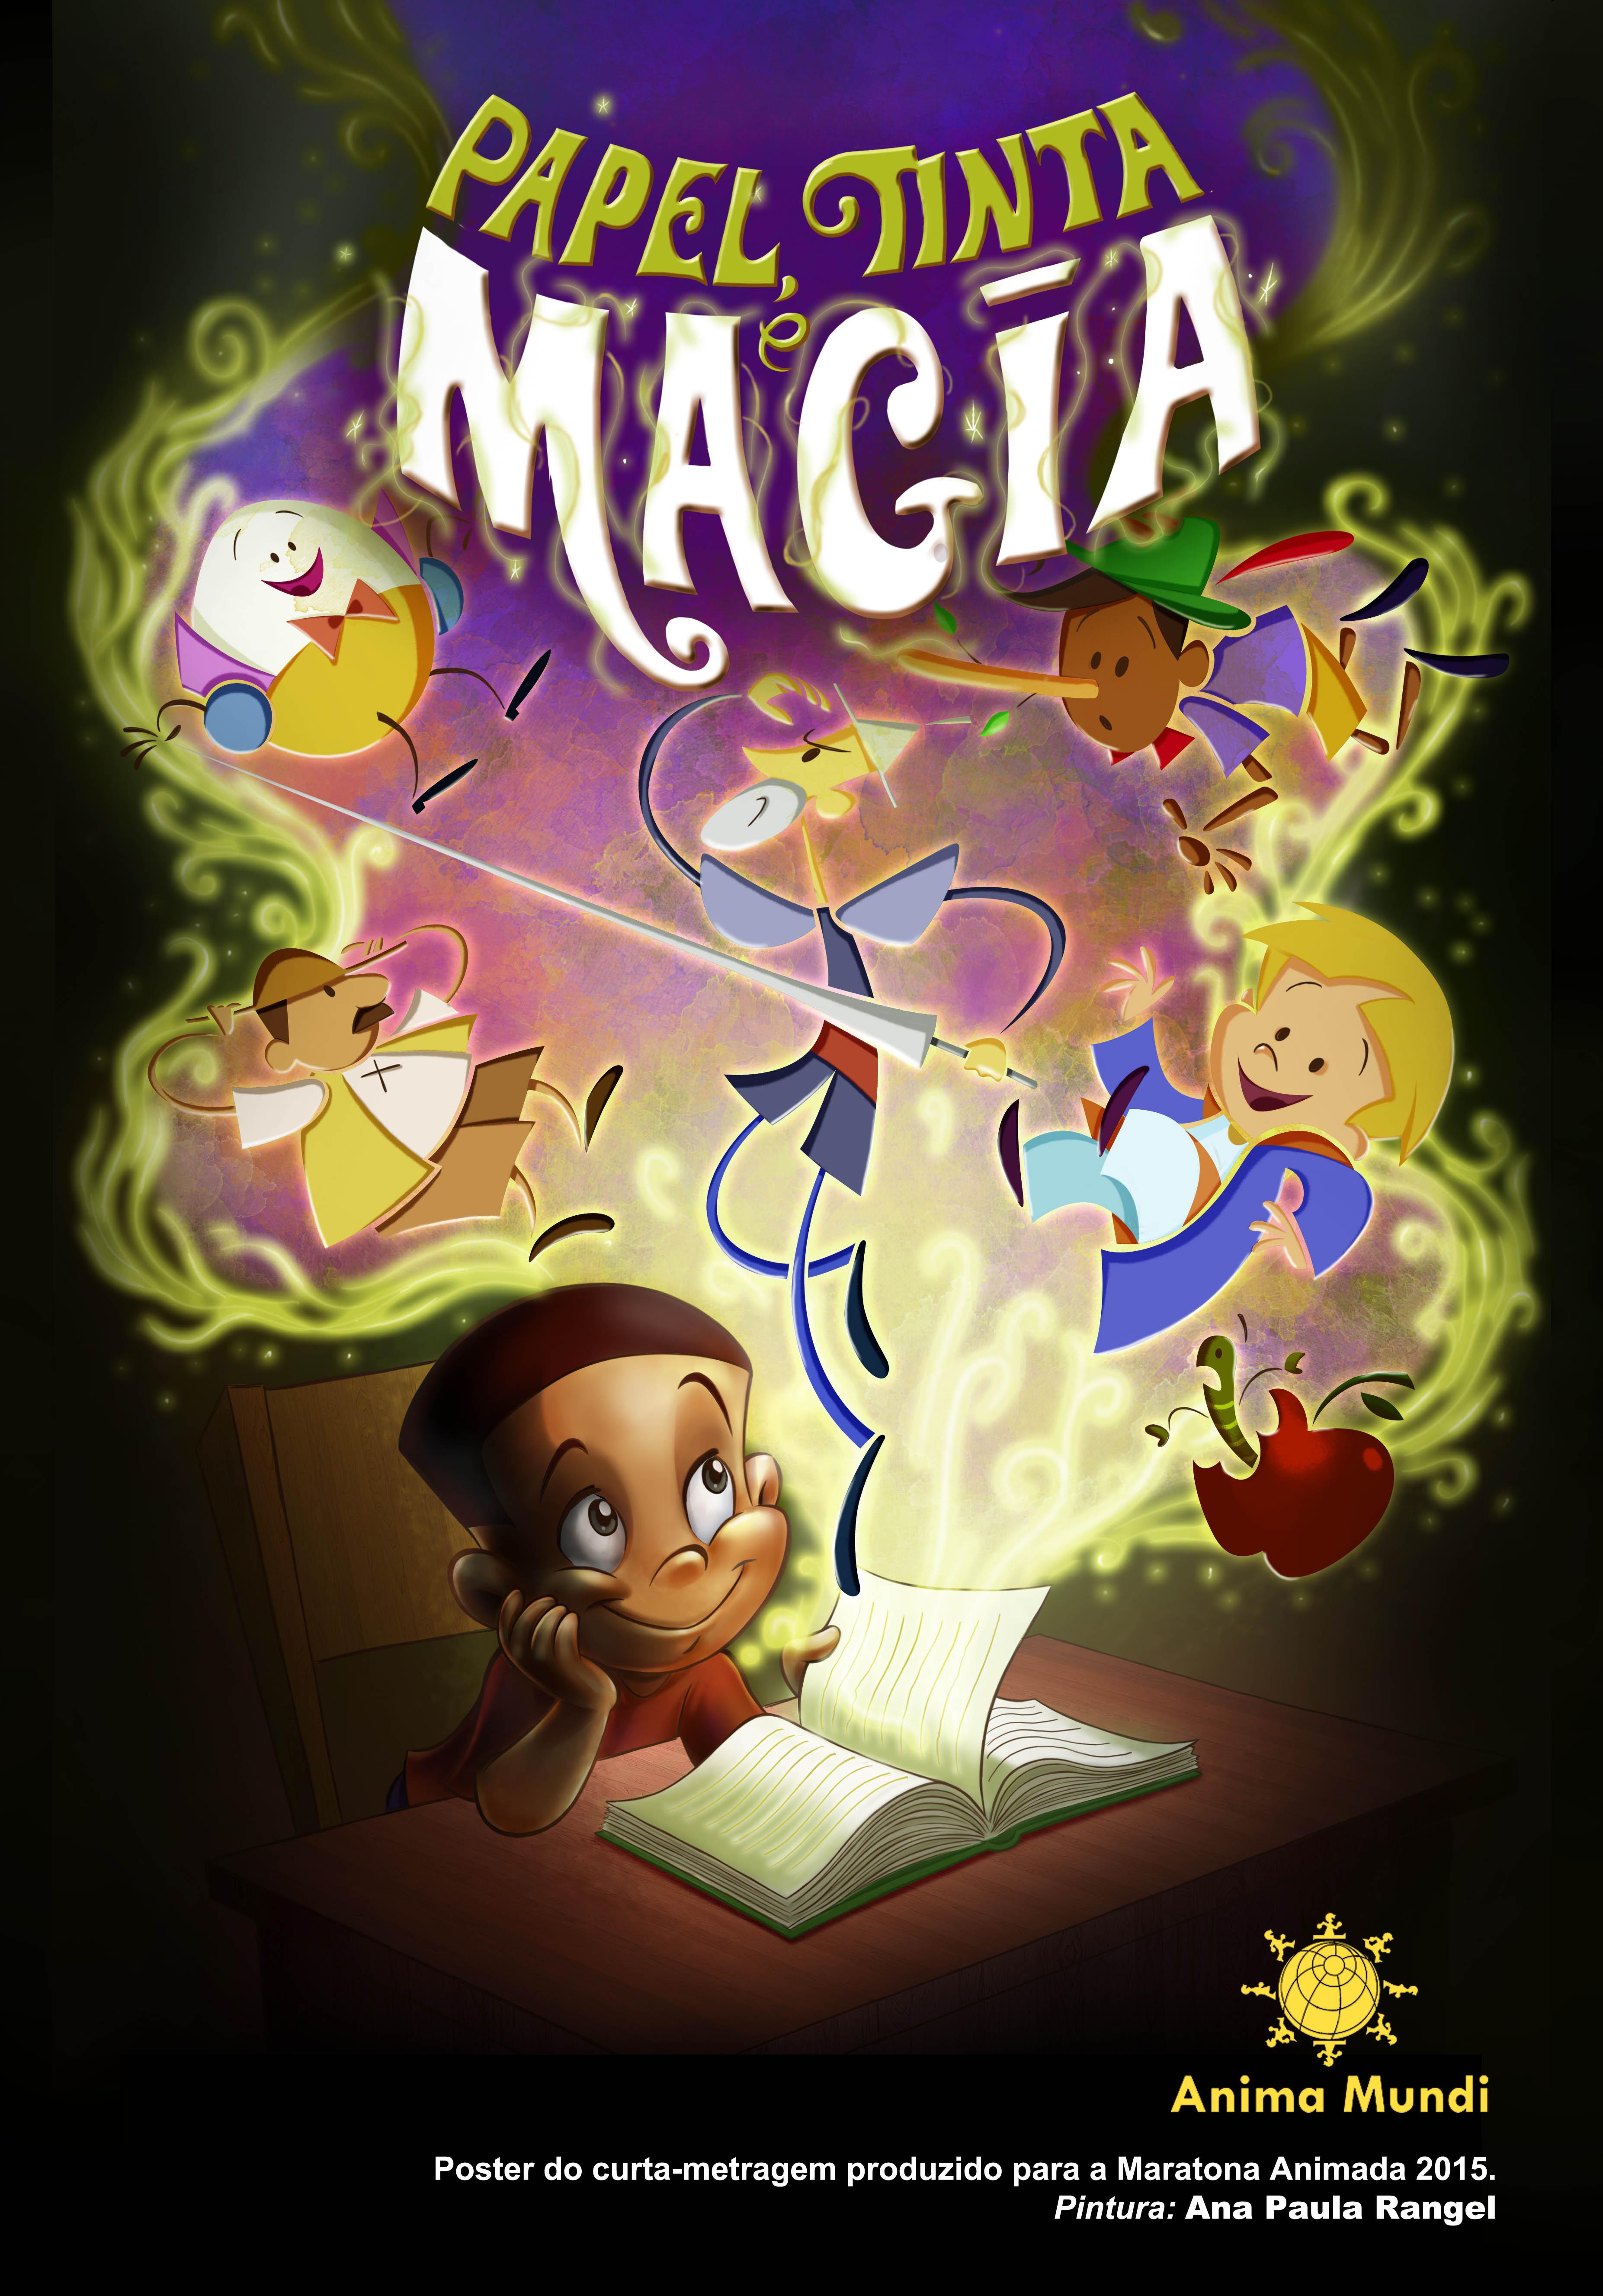 Papel Tinta e Magia